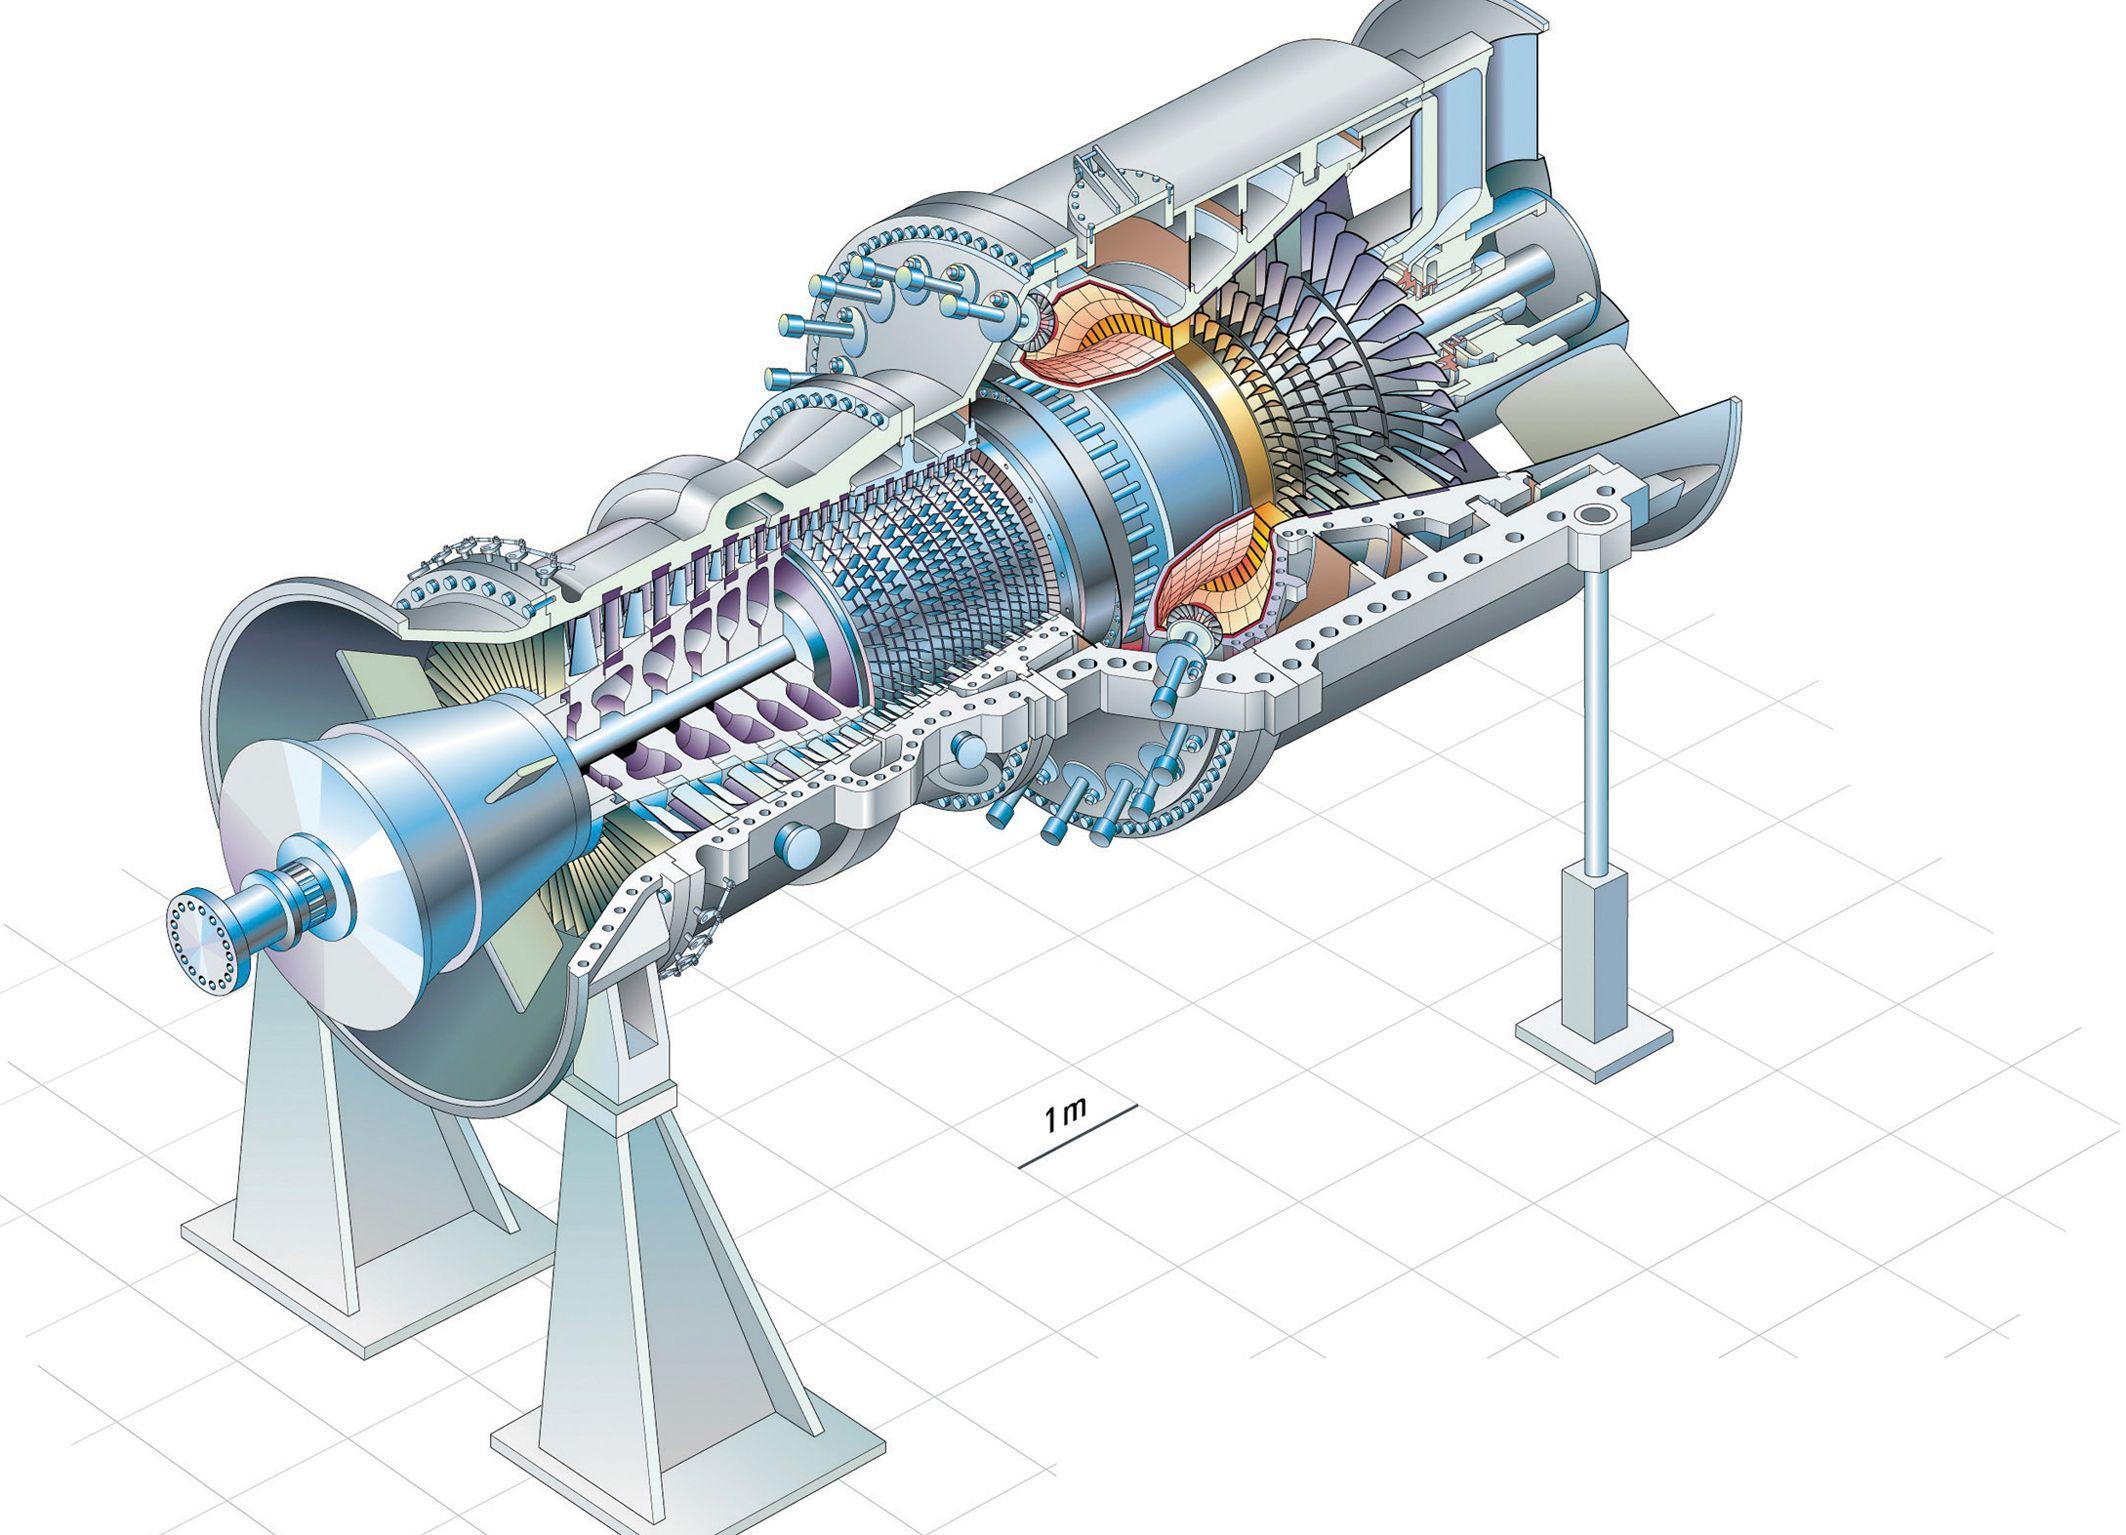 Gas turbine SGT54000F (2126×1535) Cutaways / Blueprints